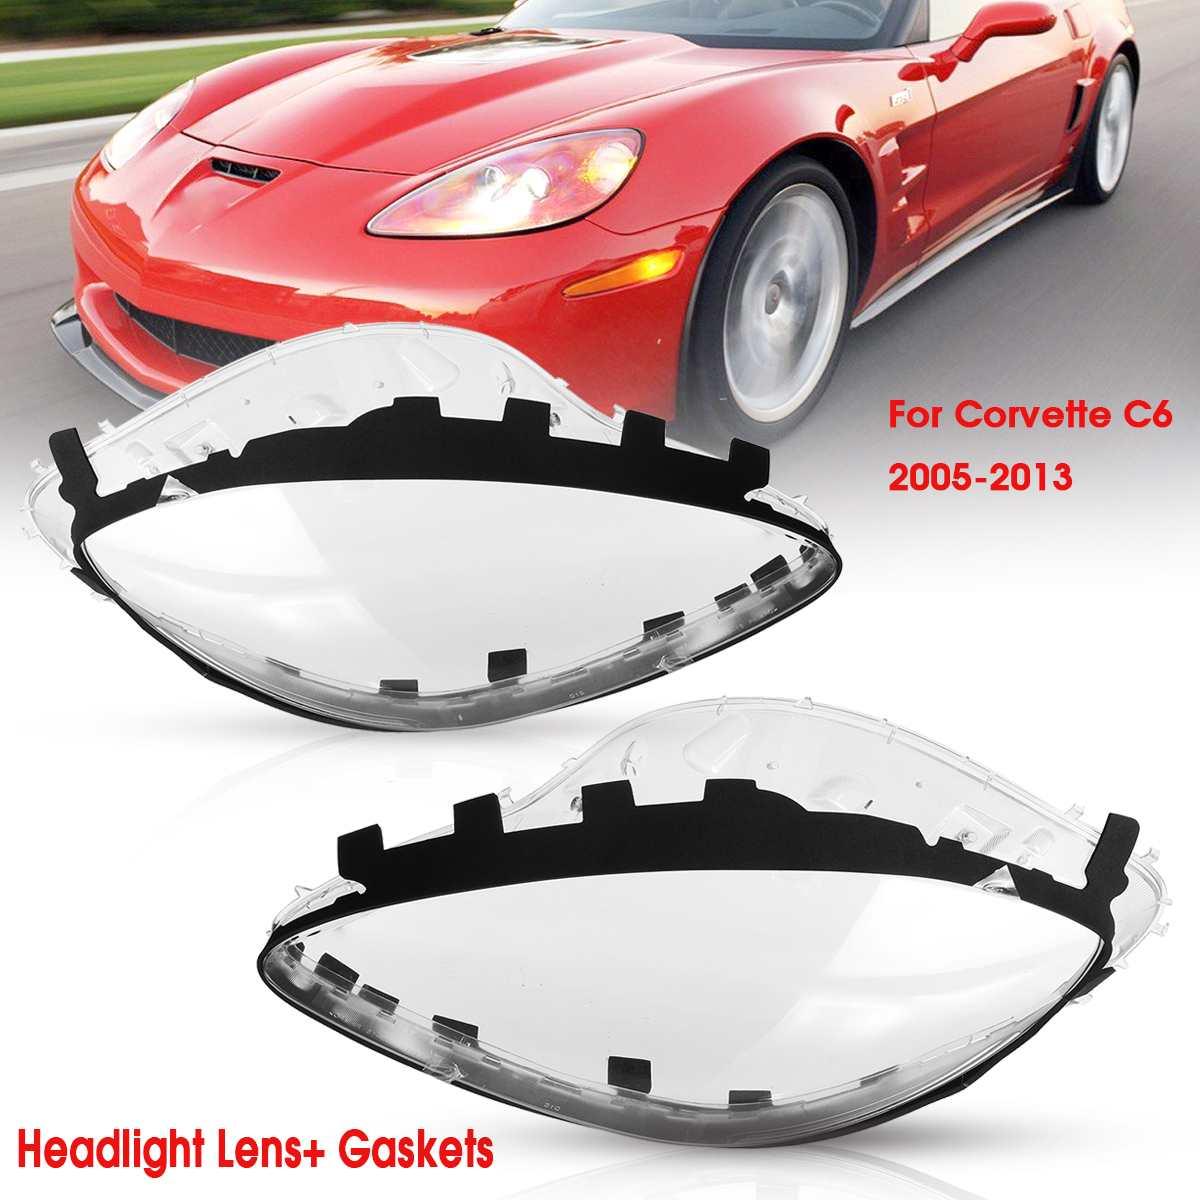 Pair Headlight Replacement Lens Driver Passenger Side For Corvette C6 2005 2013 Left Right Lenses Replacement